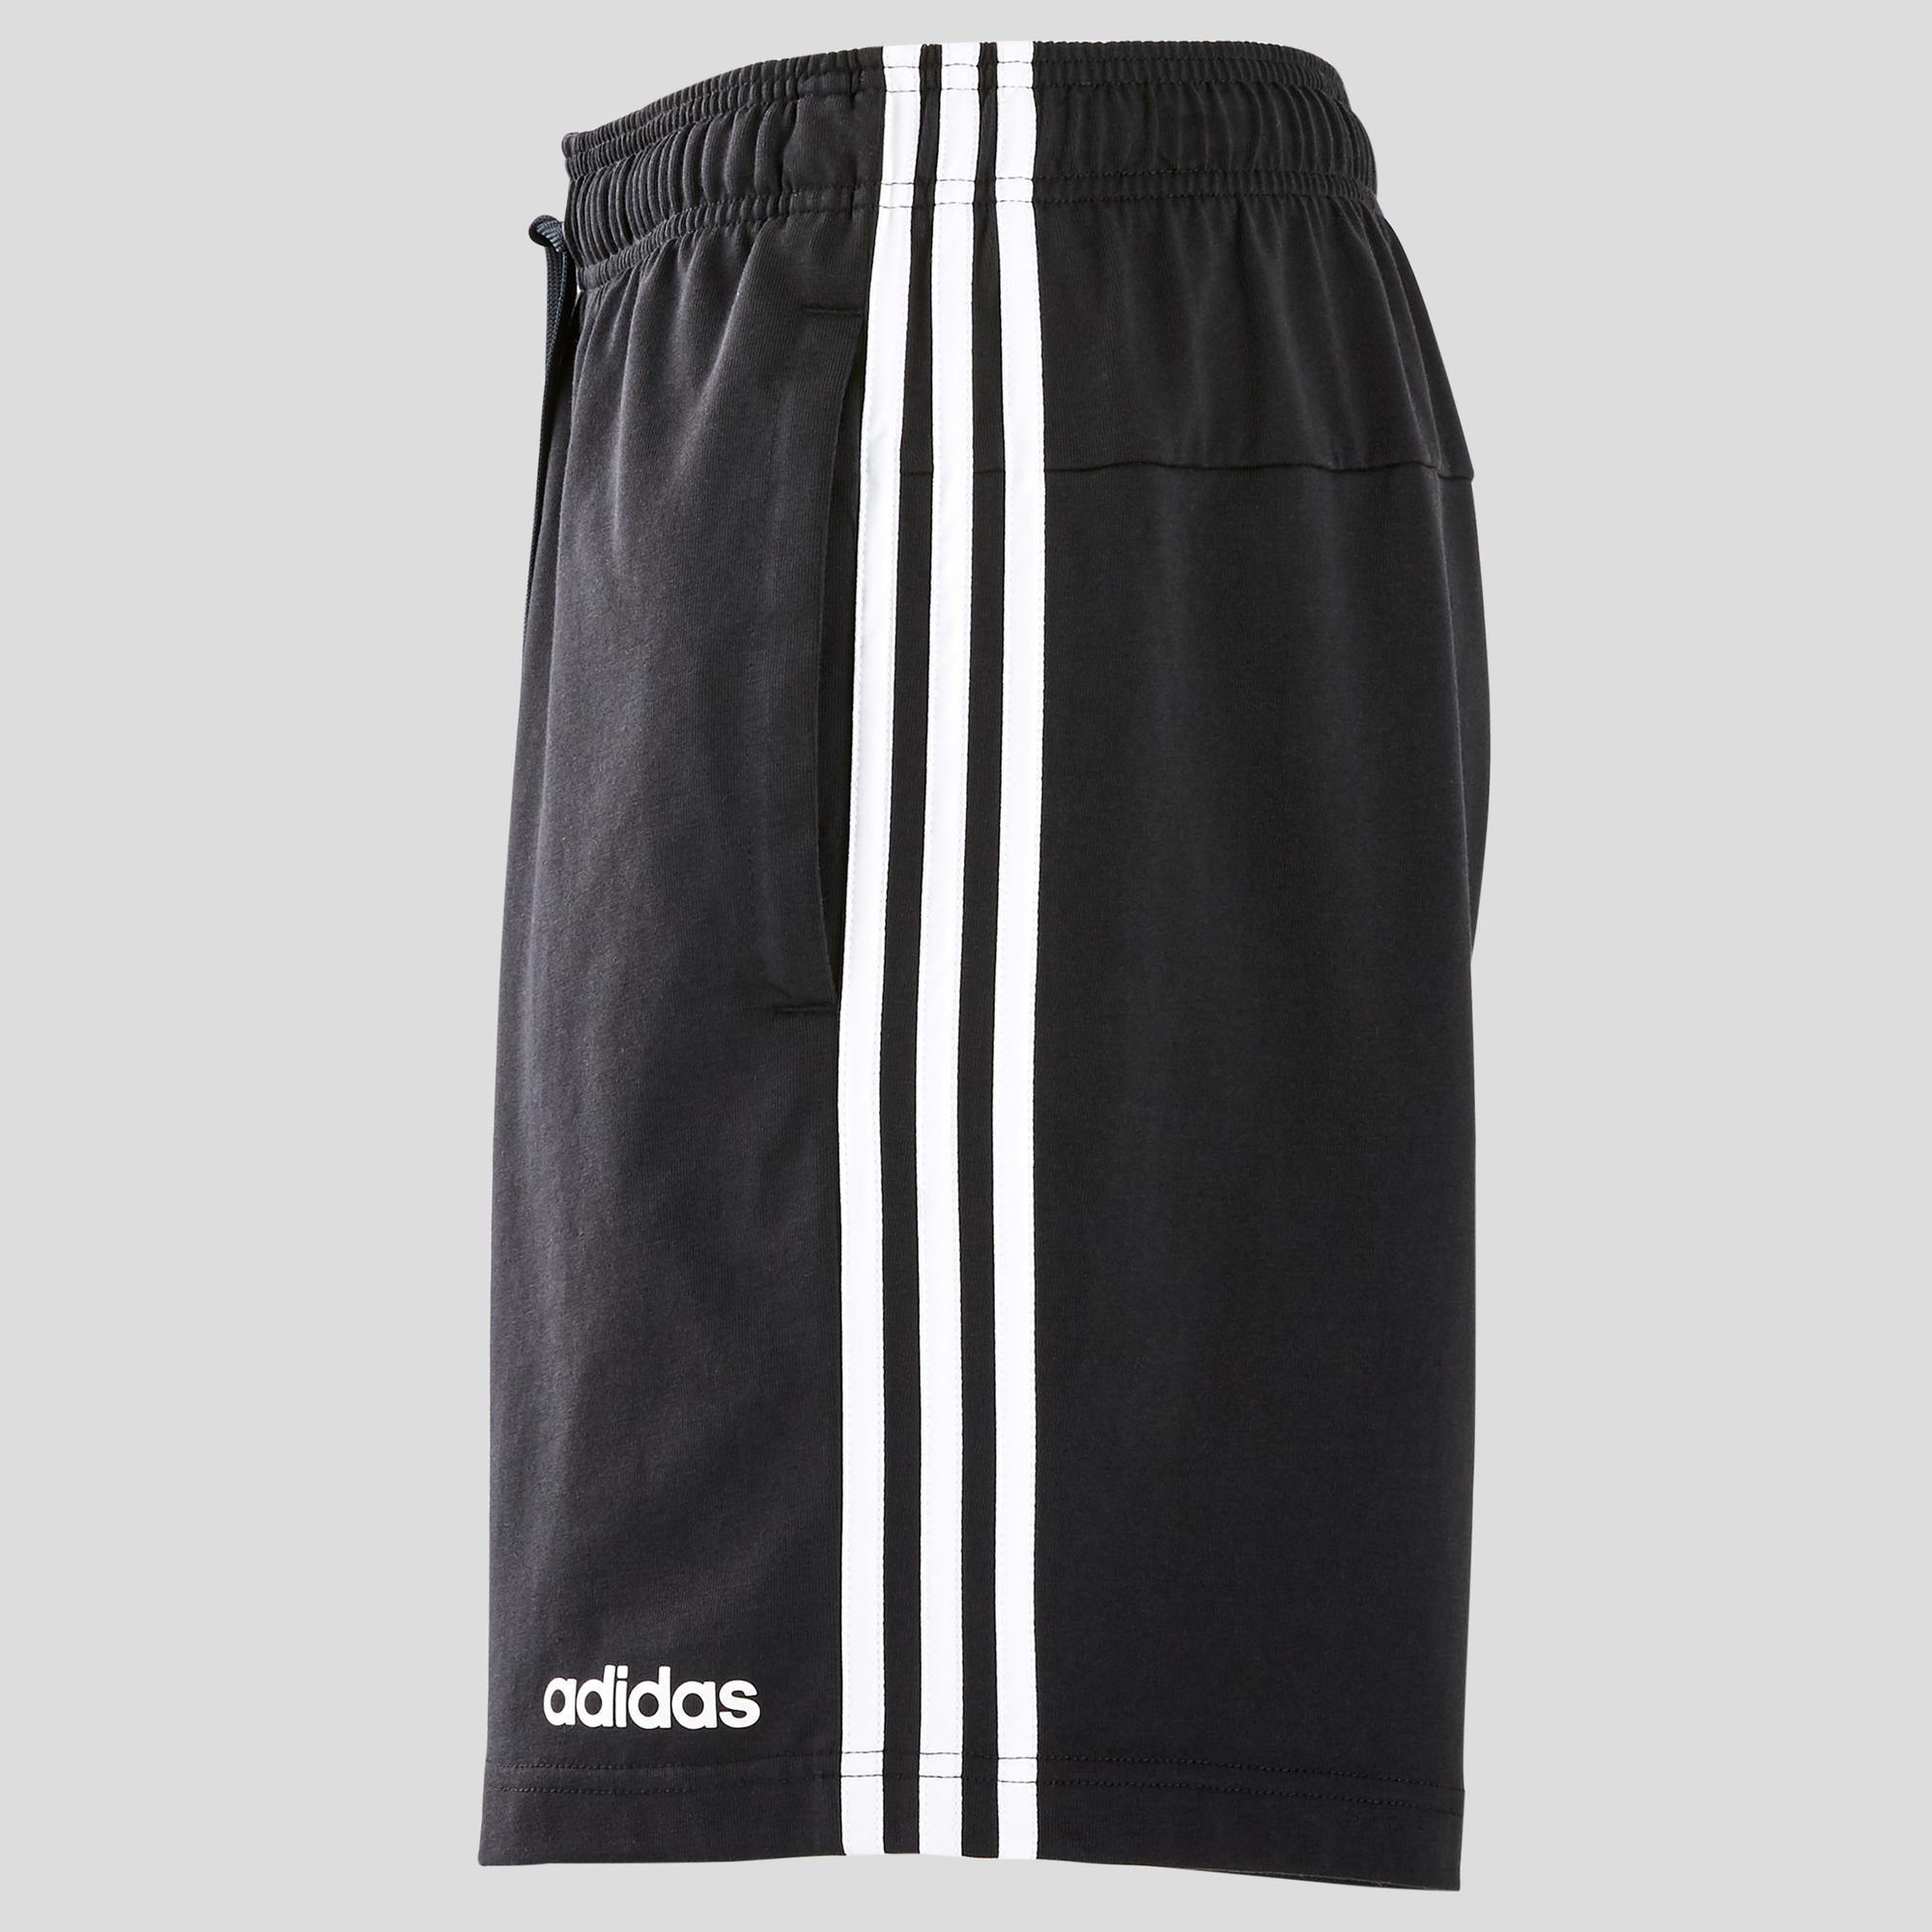 Short 3 bandes adidas regular noir homme adidas